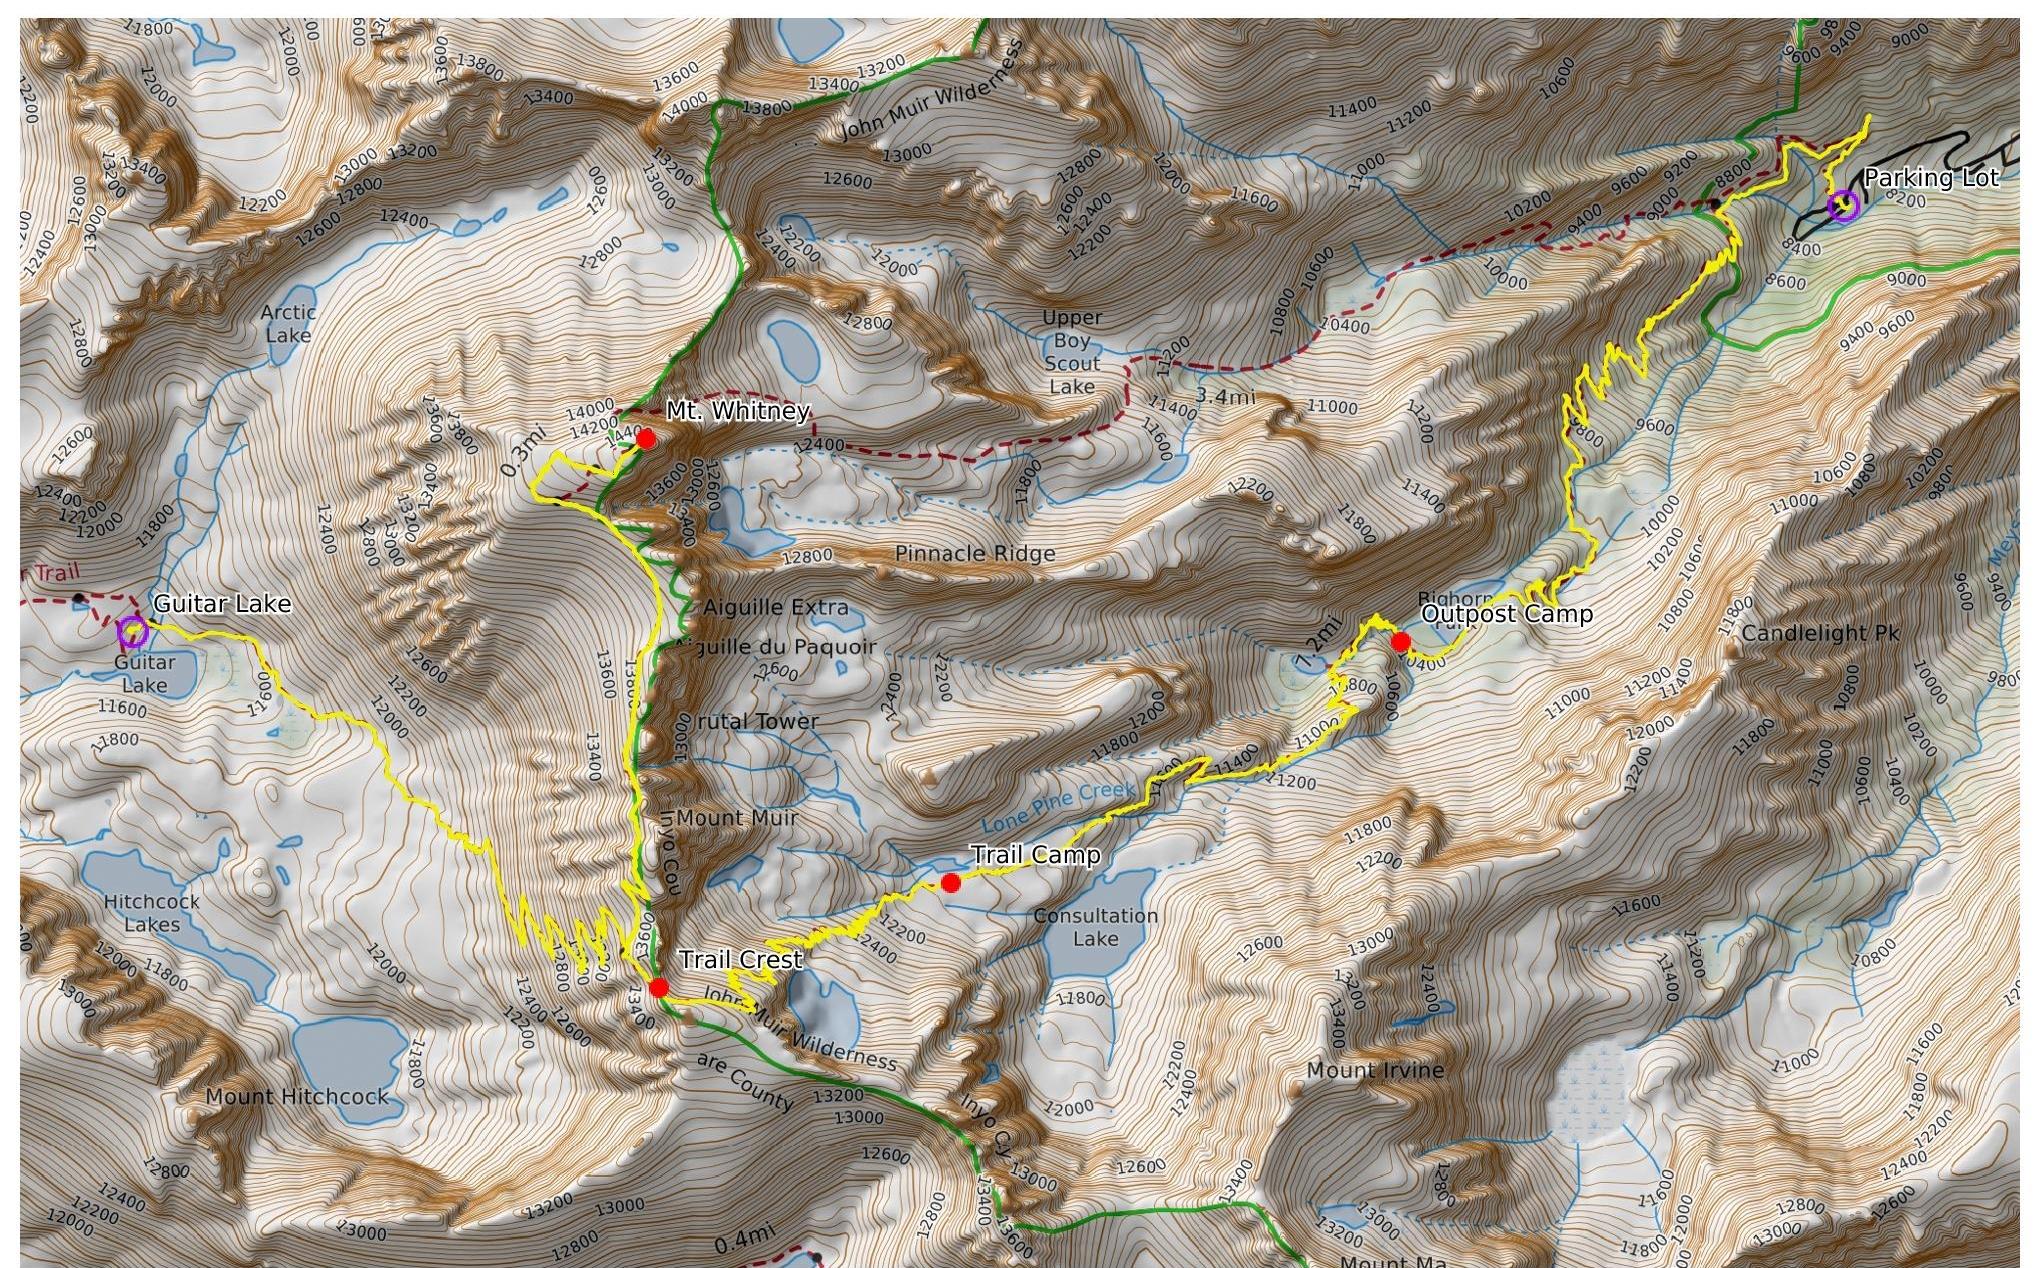 high-sierra-trail-map-guitar-lake-to-mt-whitney.jpeg